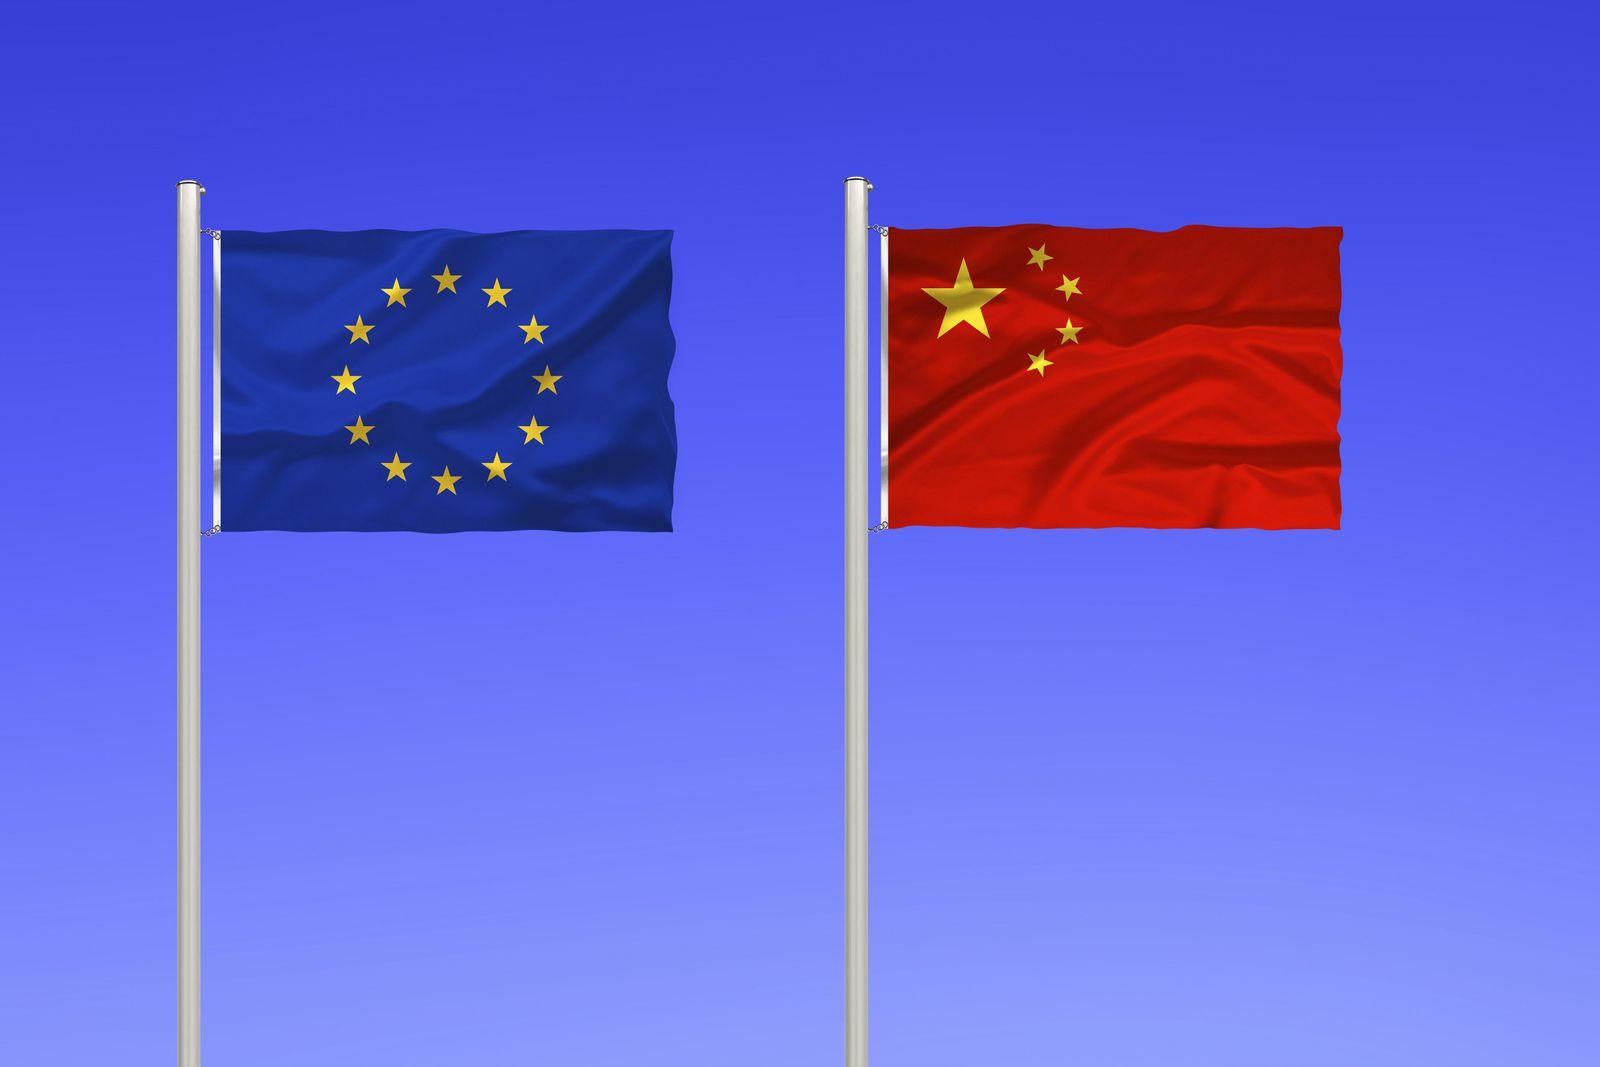 Flagge von Euroap und China vor blauem Himmel, flag of Europe and China against blue sky